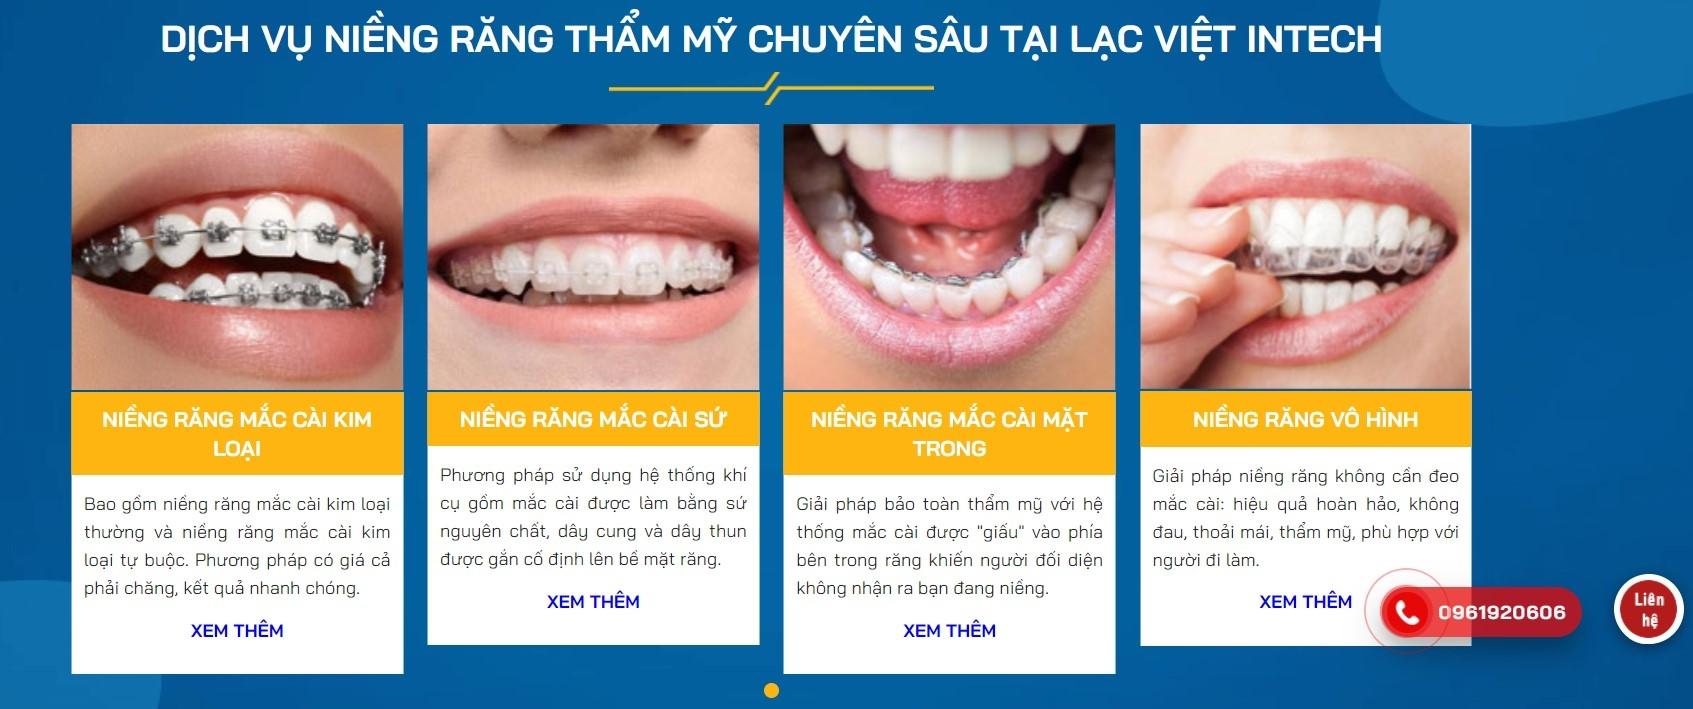 Niềng răng mắc cài kim loại LacVietIntechVN (@niengranginvisalignlacvietintechvn) Cover Image